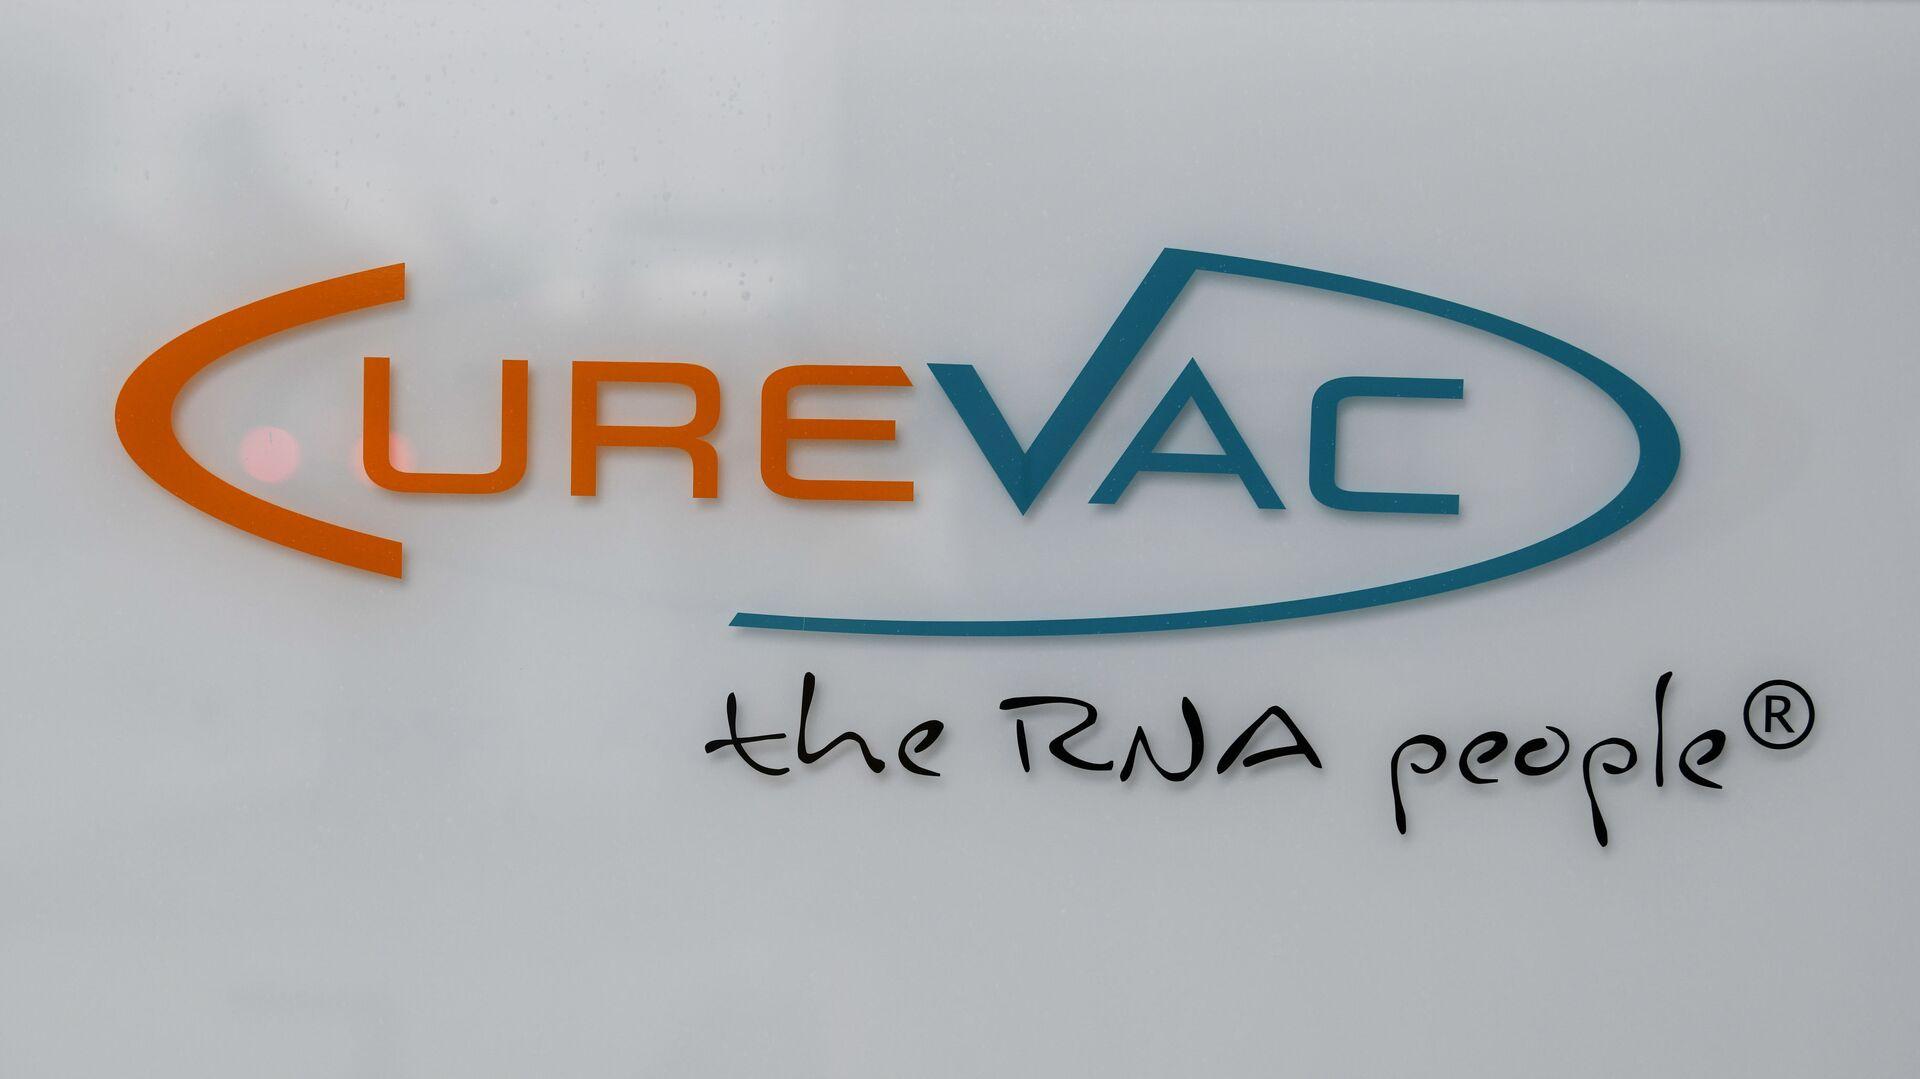 Vaccino Curevac - Sputnik Italia, 1920, 17.06.2021